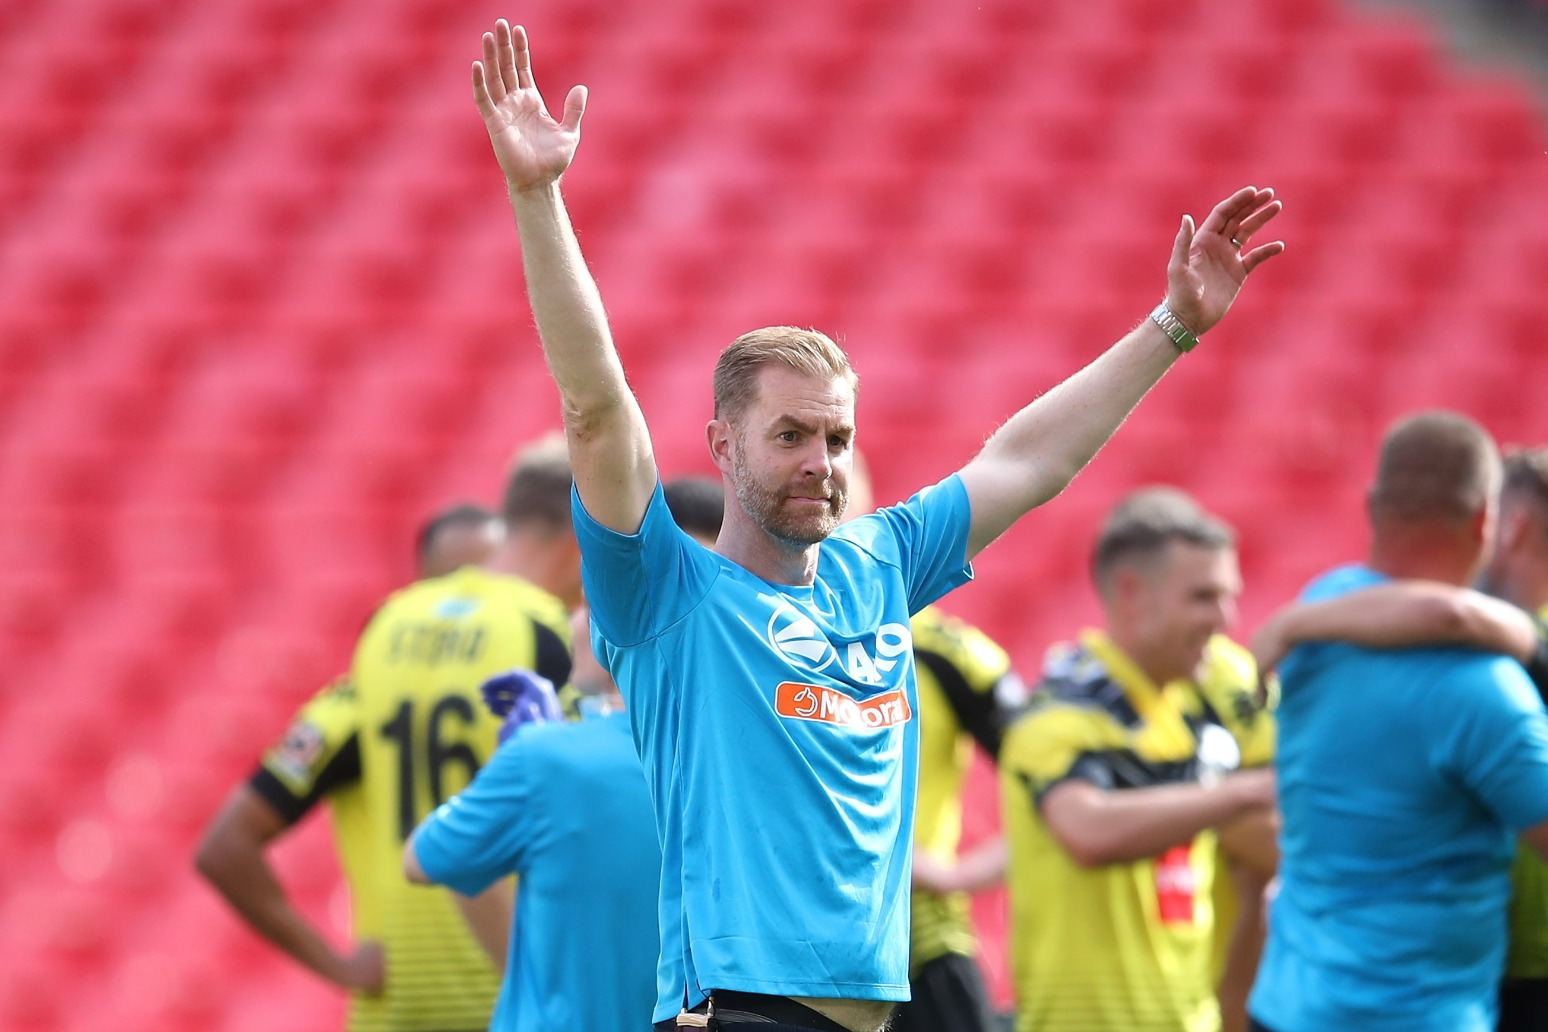 Simon Weaver 'ecstatic' as Wembley win takes Harrogate up to League Two